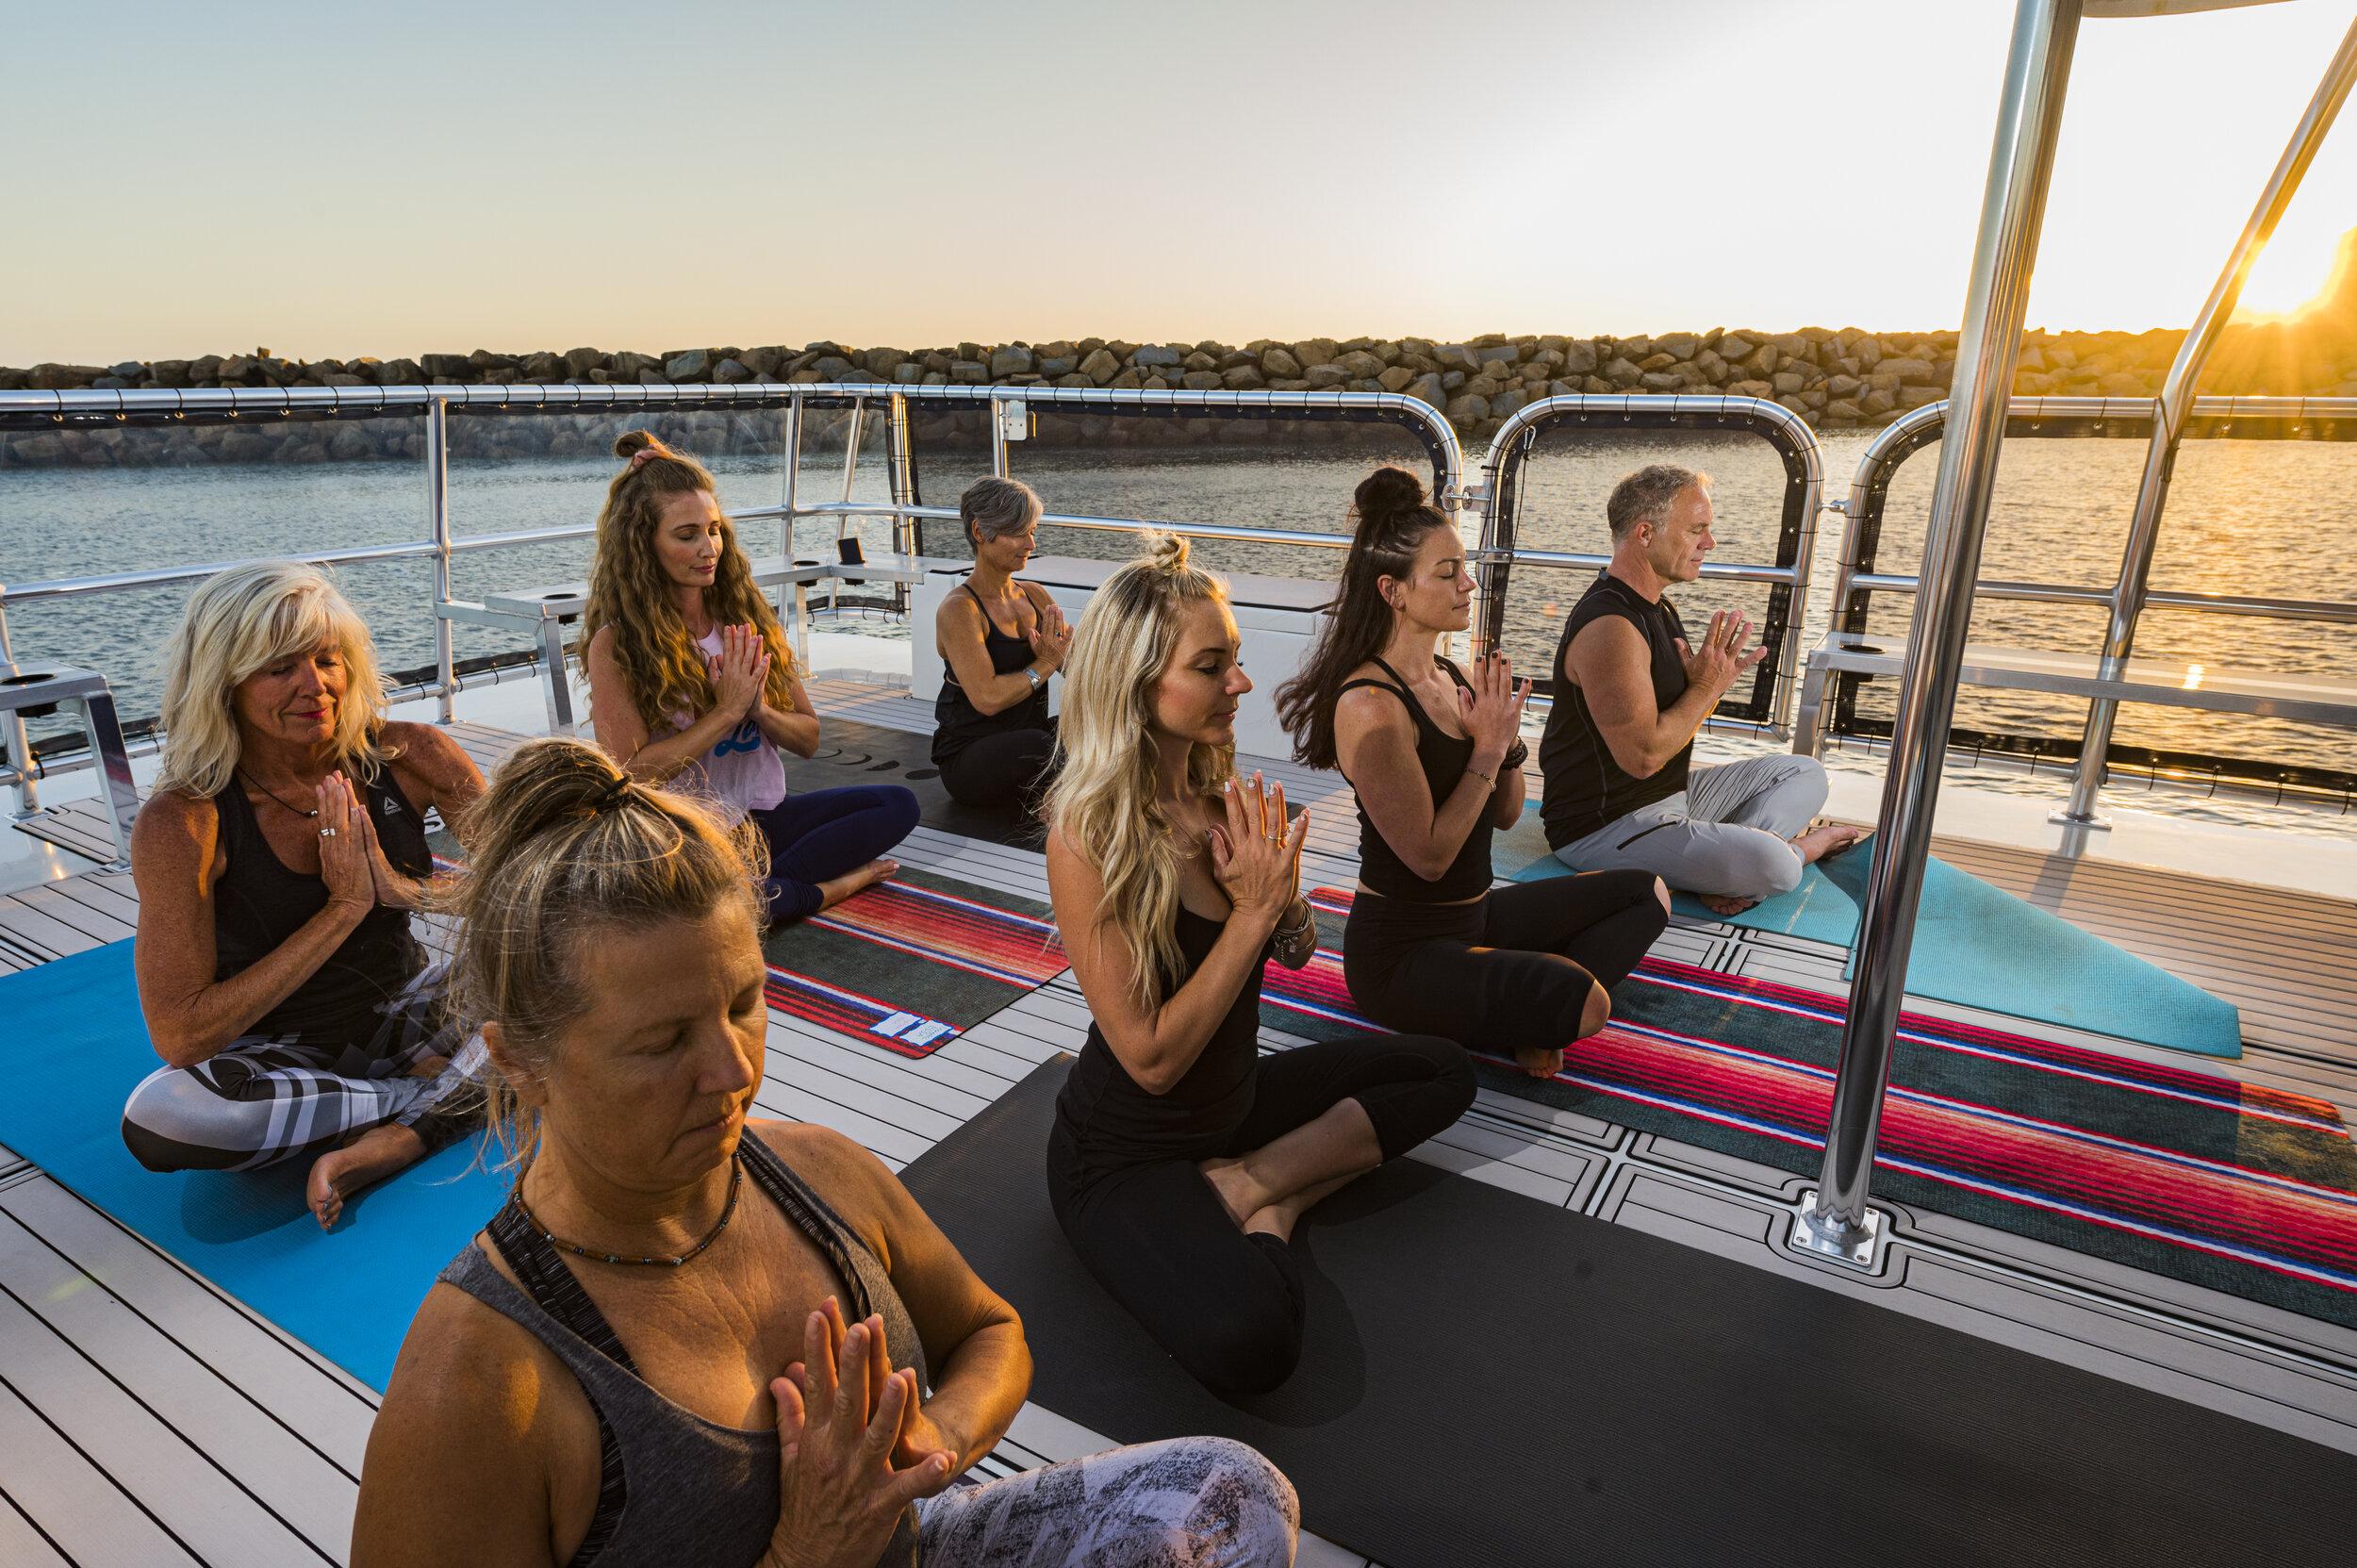 YAcht yoga - Dana Wharf and iHeartYoga present Yacht Yoga in Dana Point Harbor